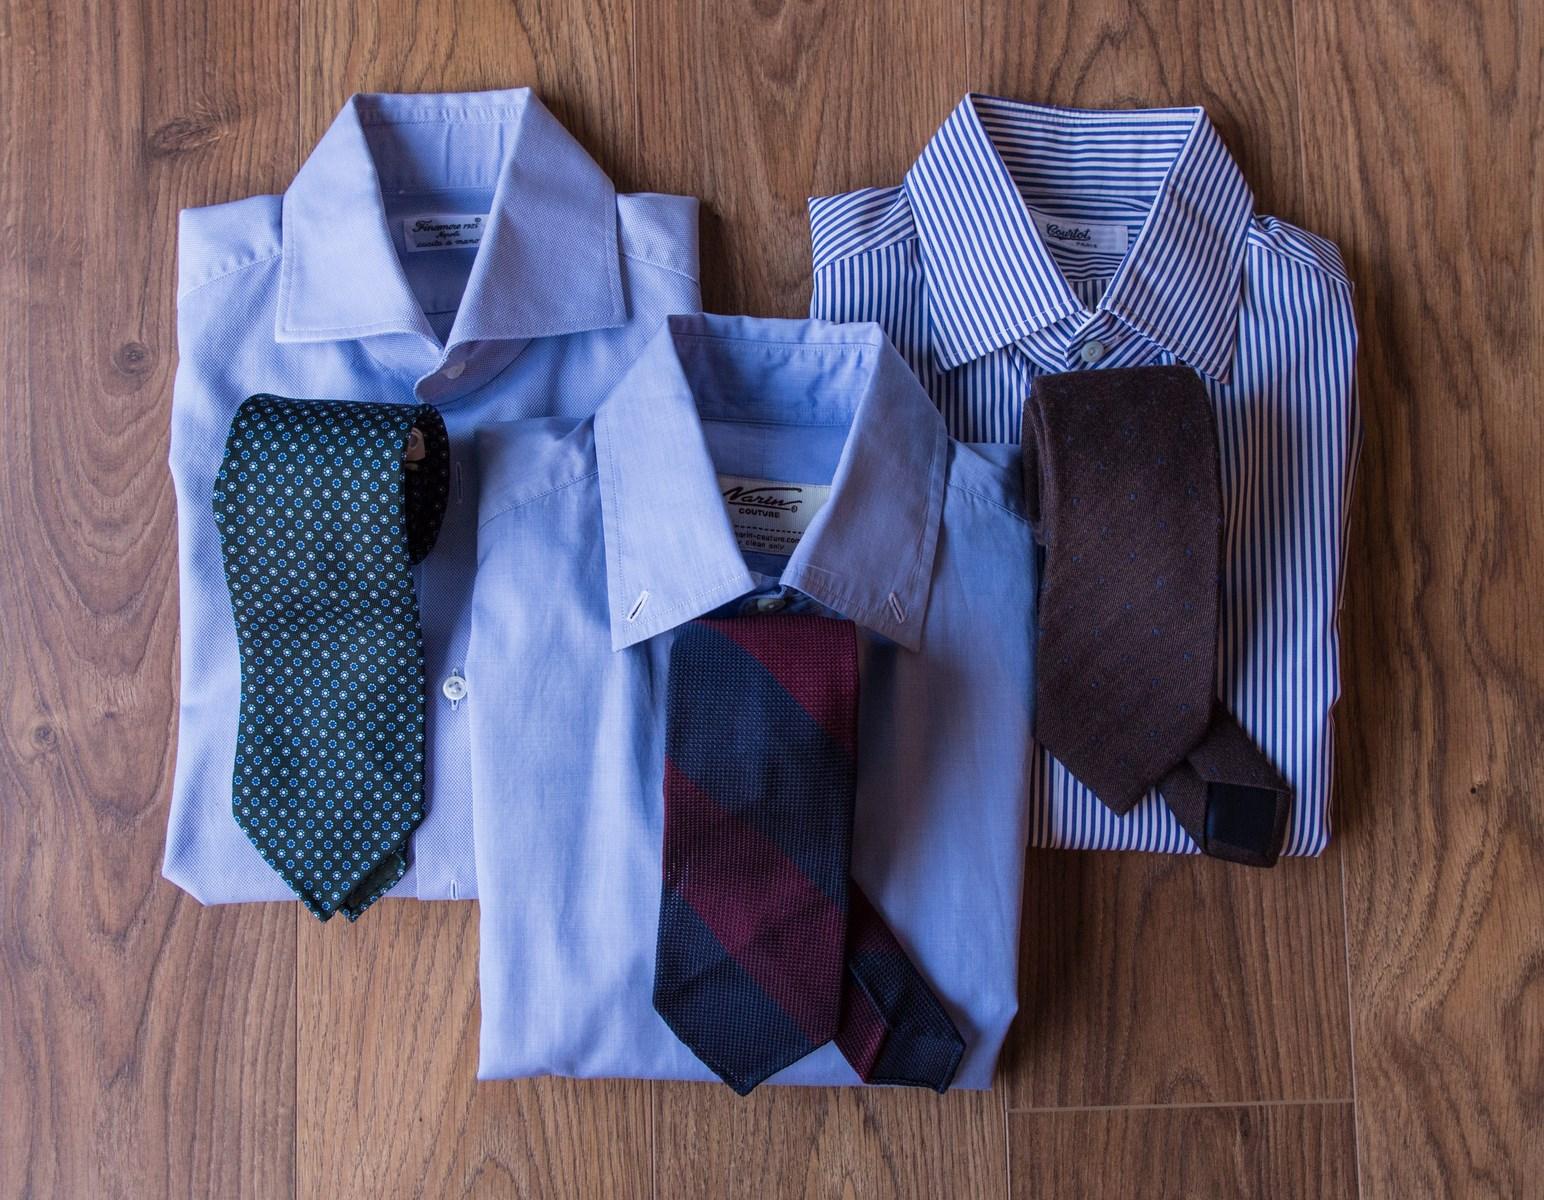 The Gentleman Traveler pt. 1 : folding your shirts